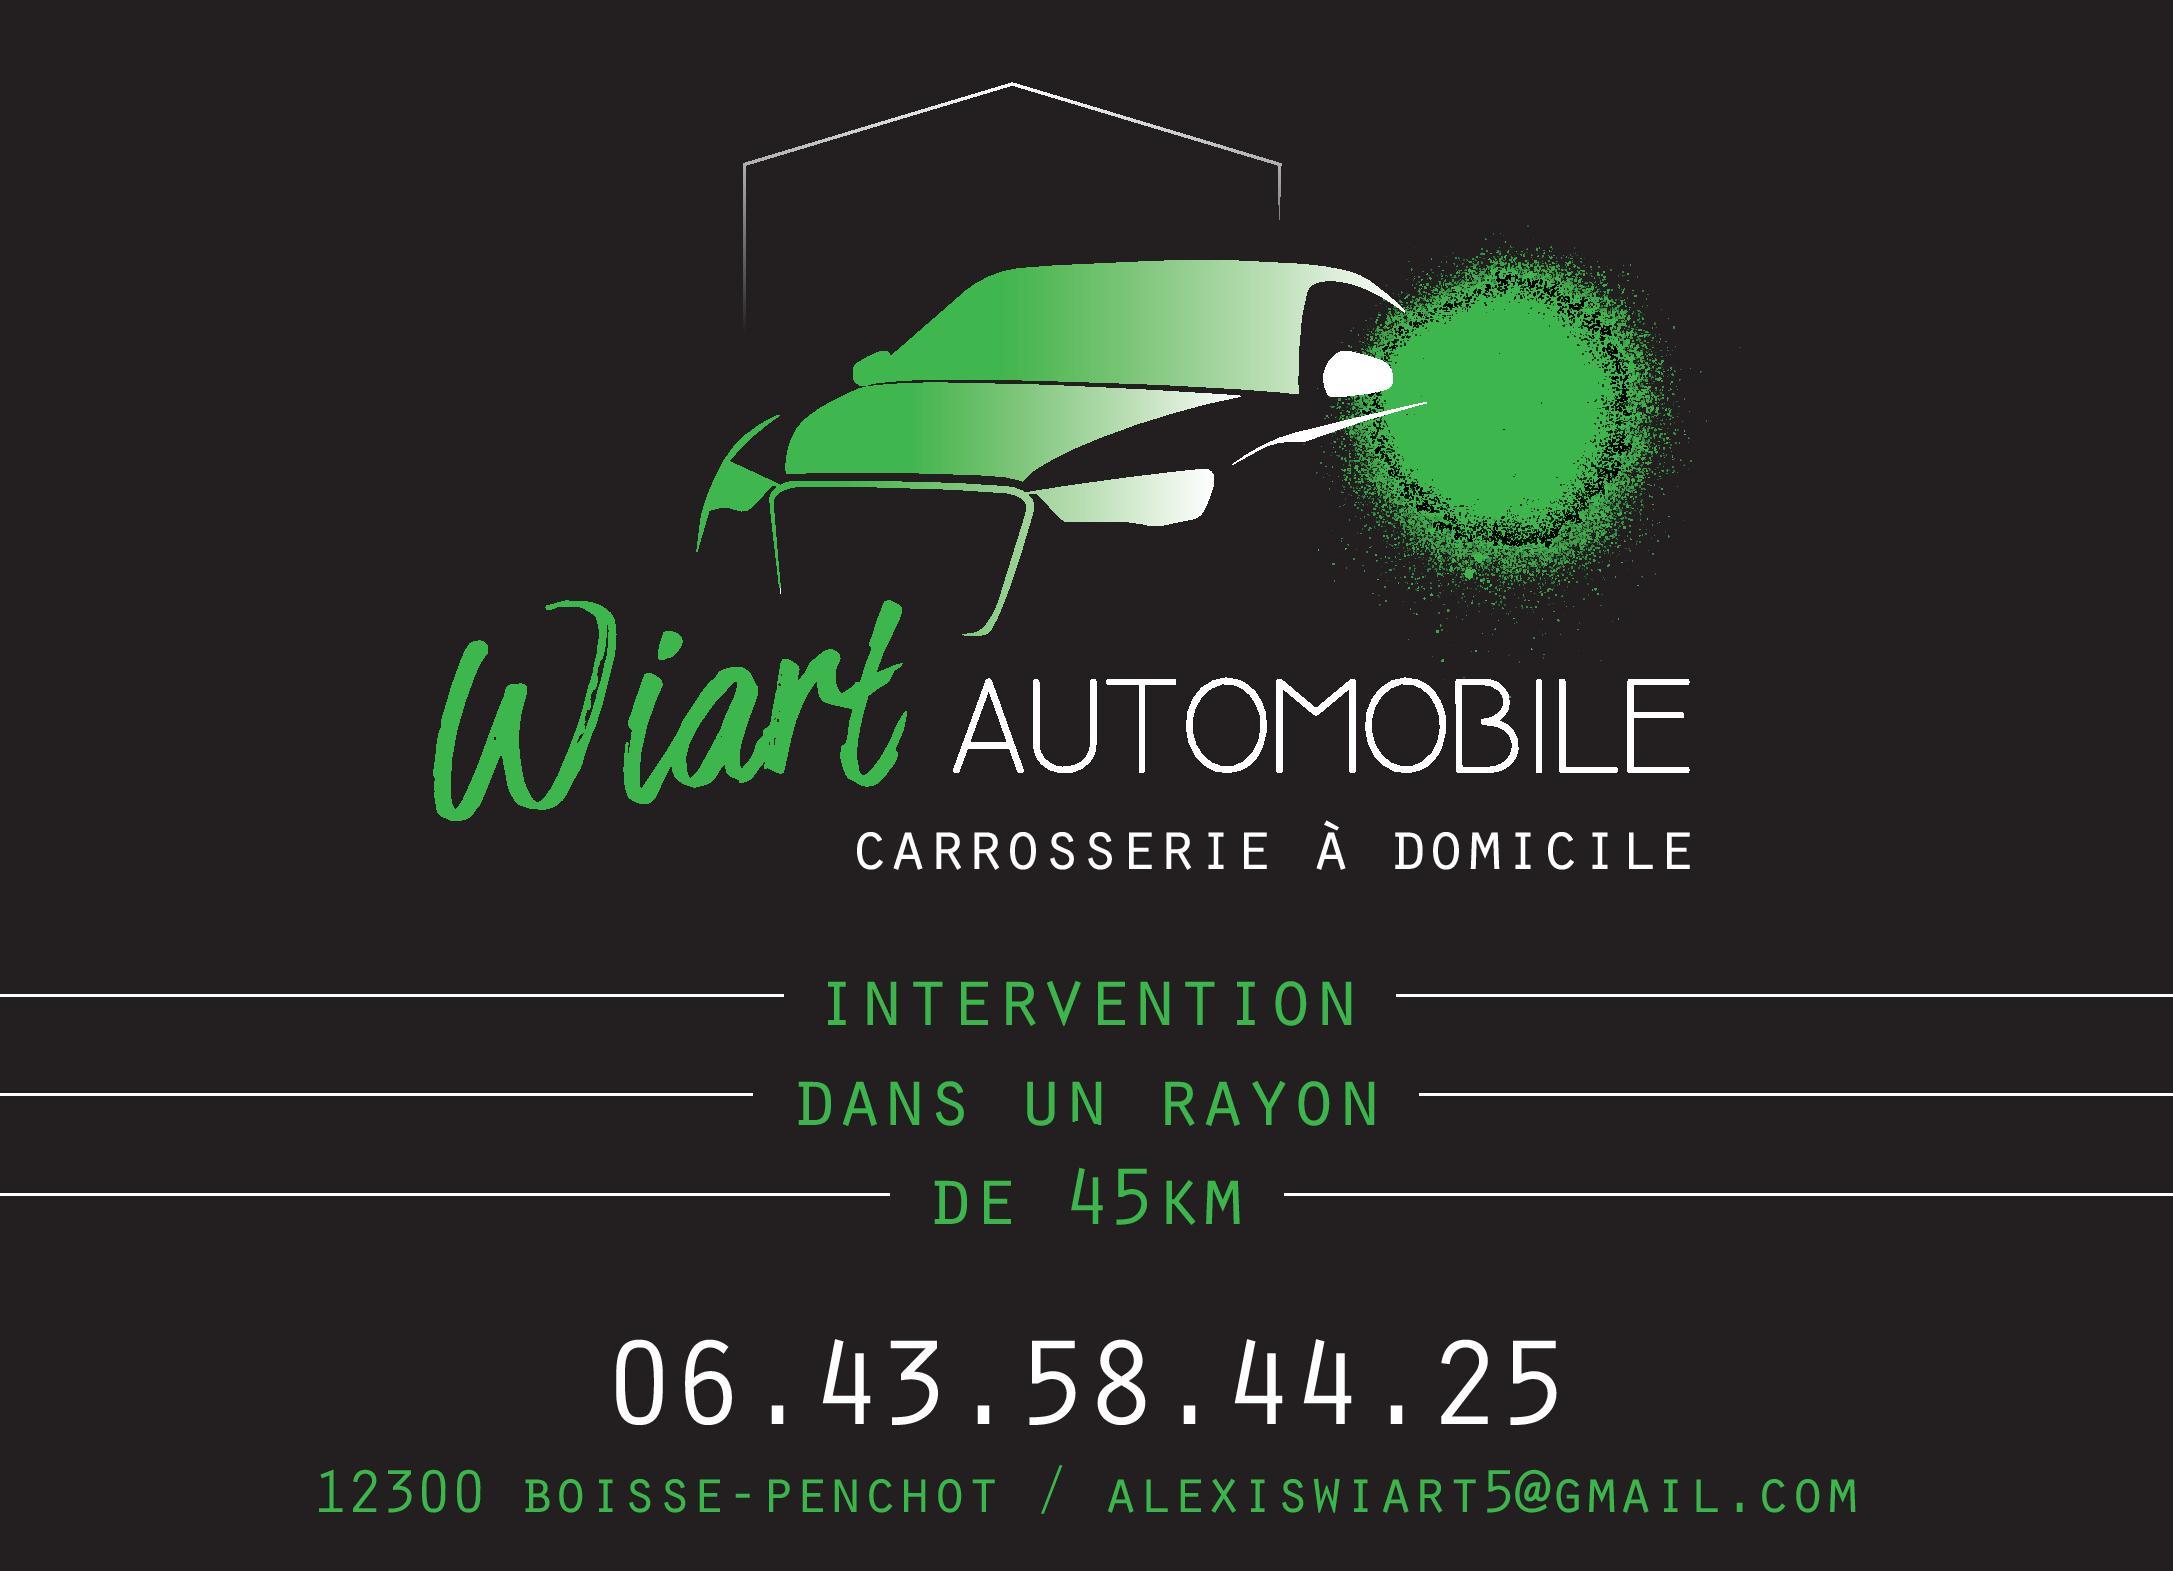 Wiart Automobile